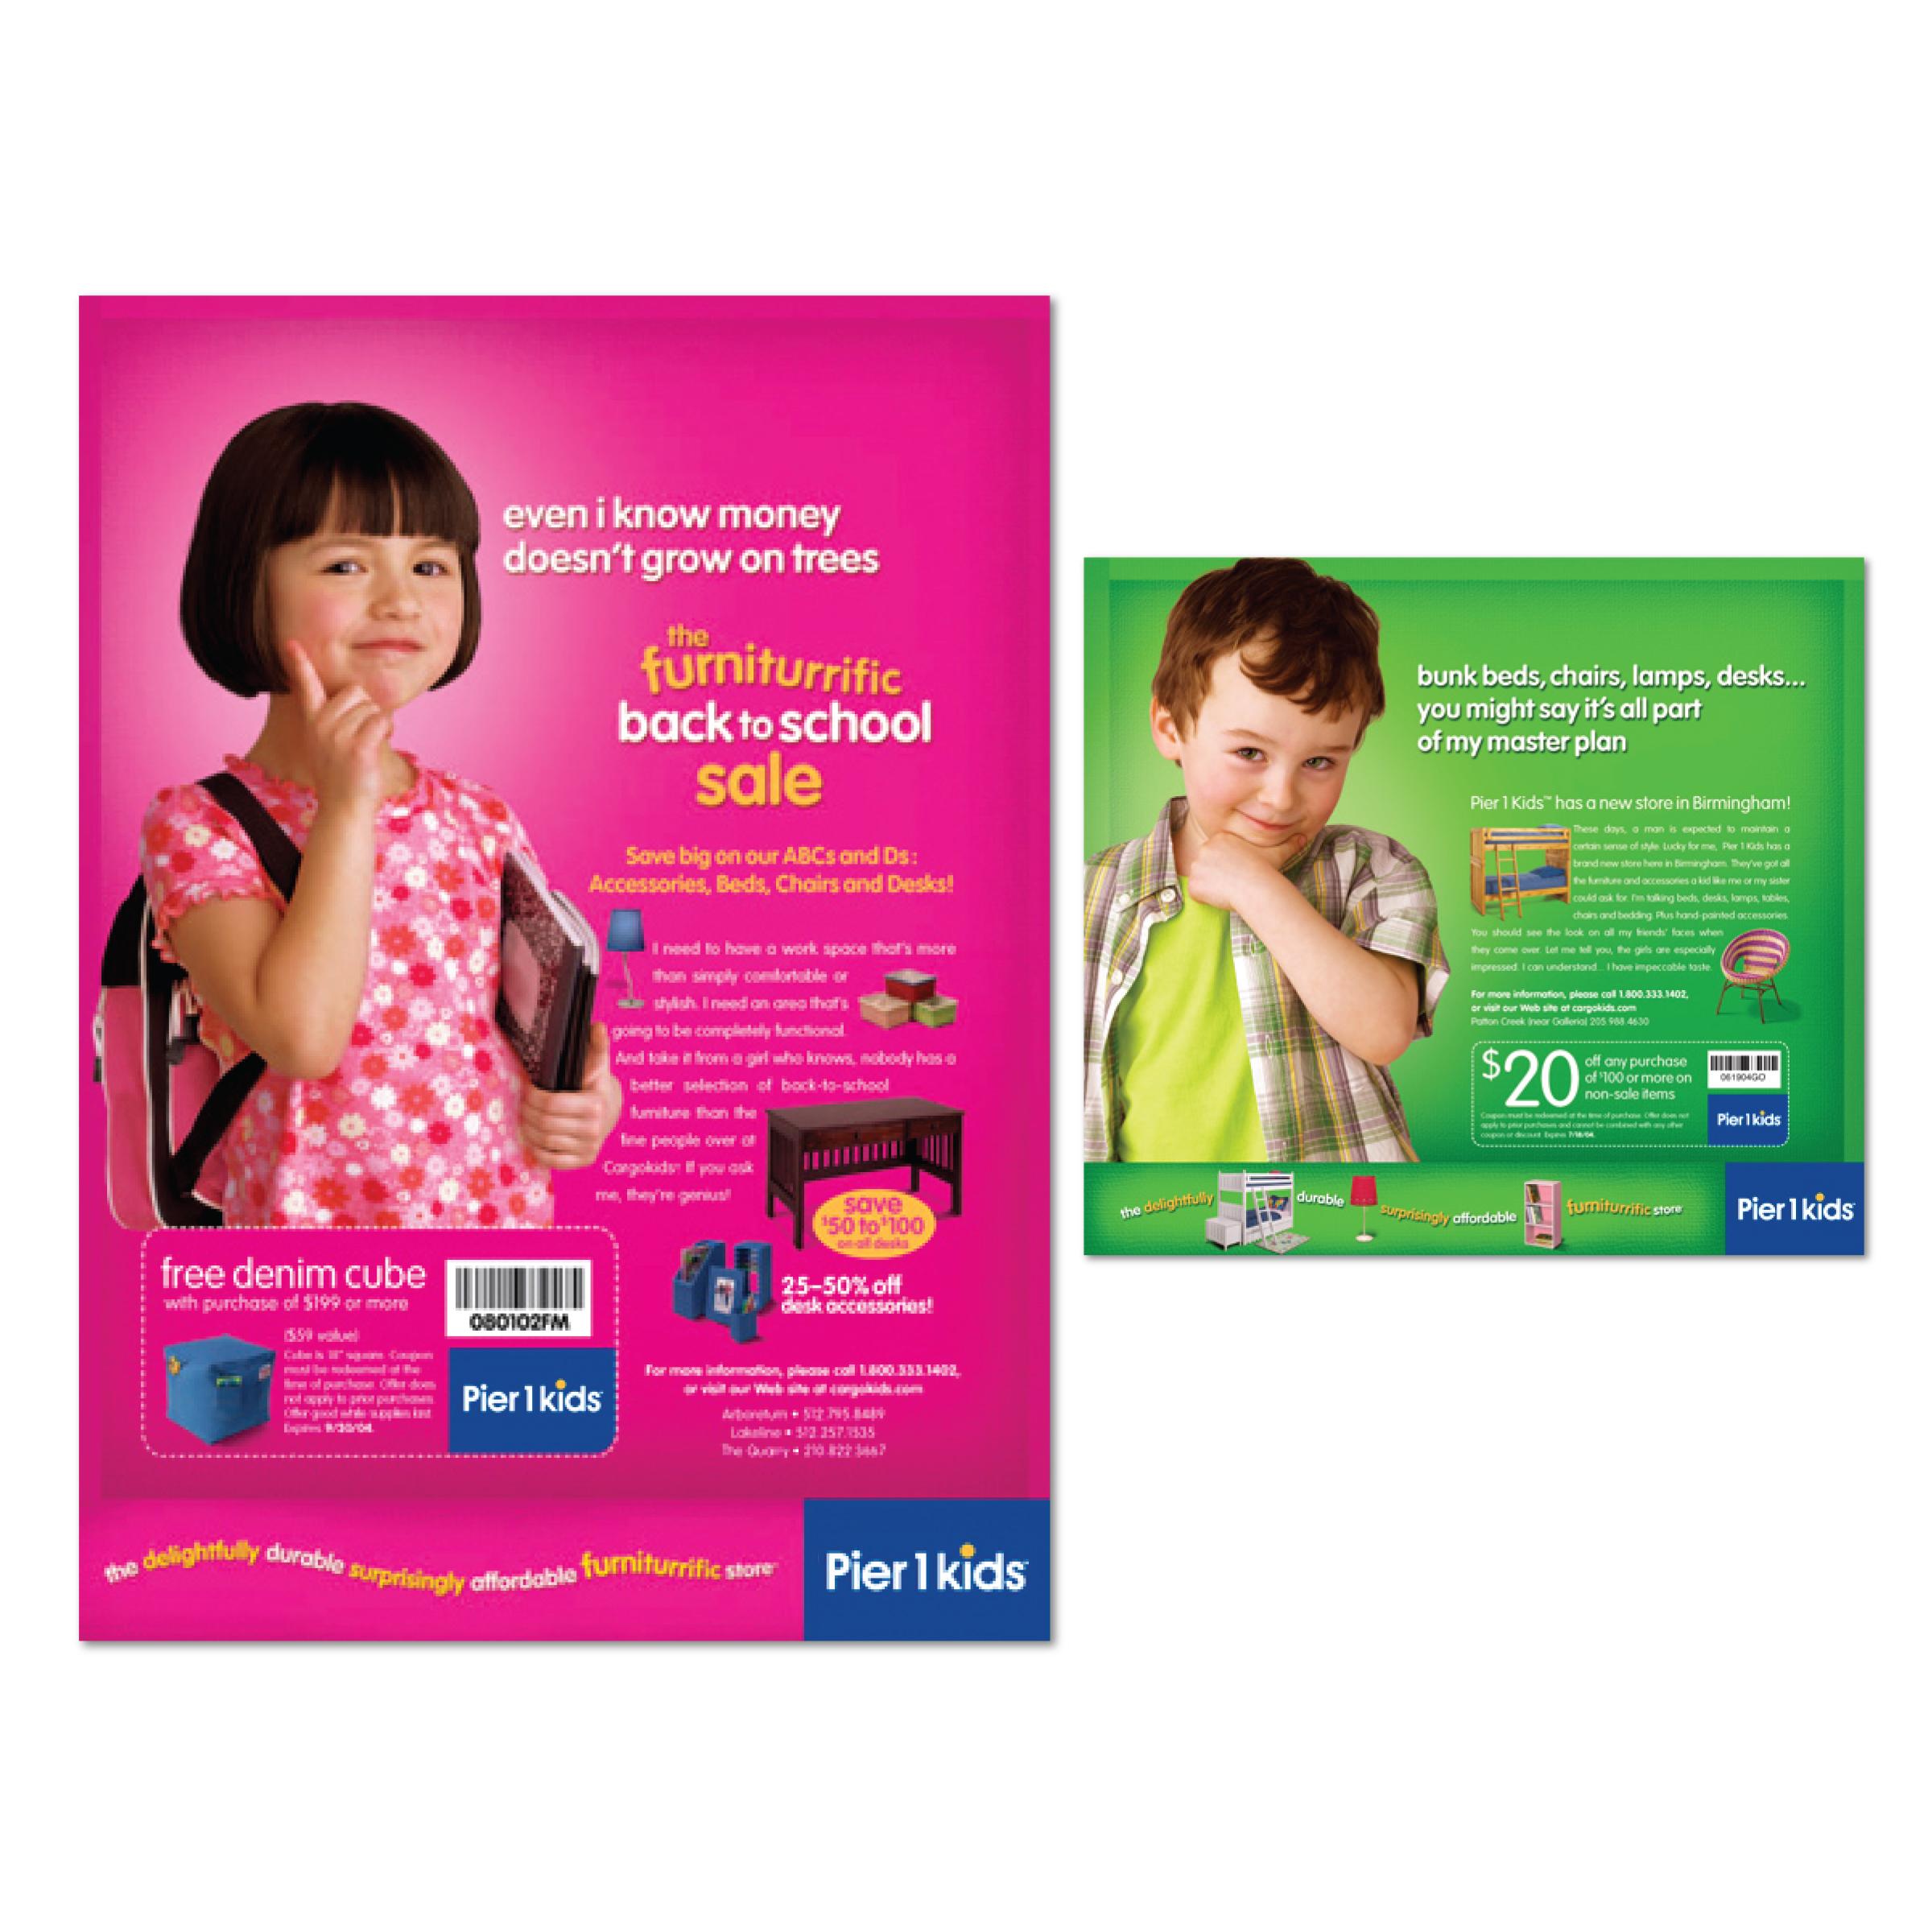 PIER 1 KIDS PROMO ADS.jpg